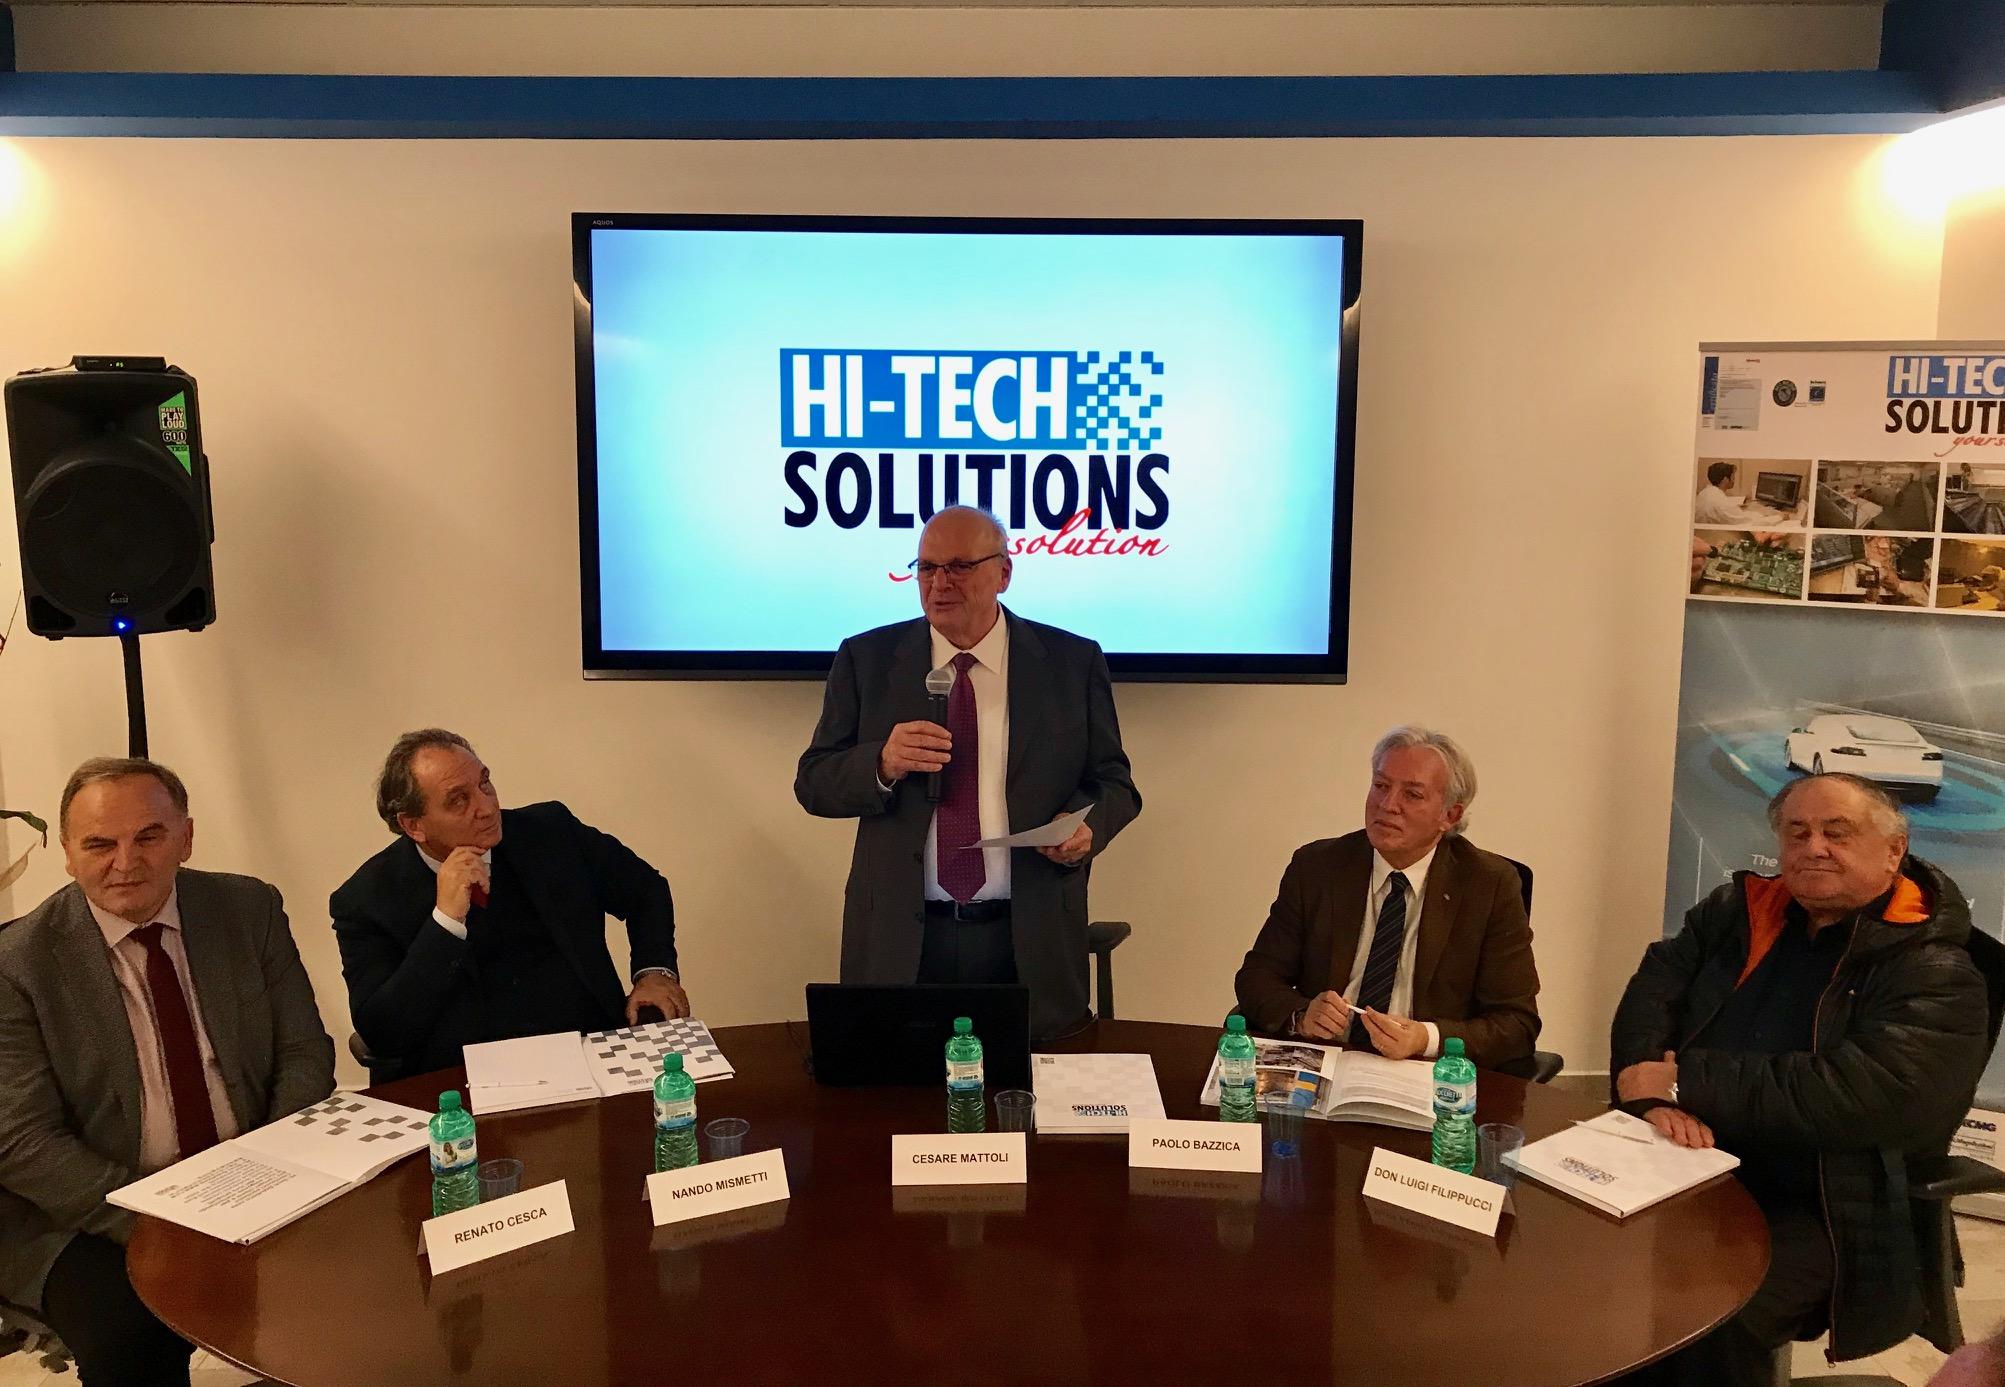 Hi Tech Solutions: in Asia soluzioni hi-tech 'made in Foligno'